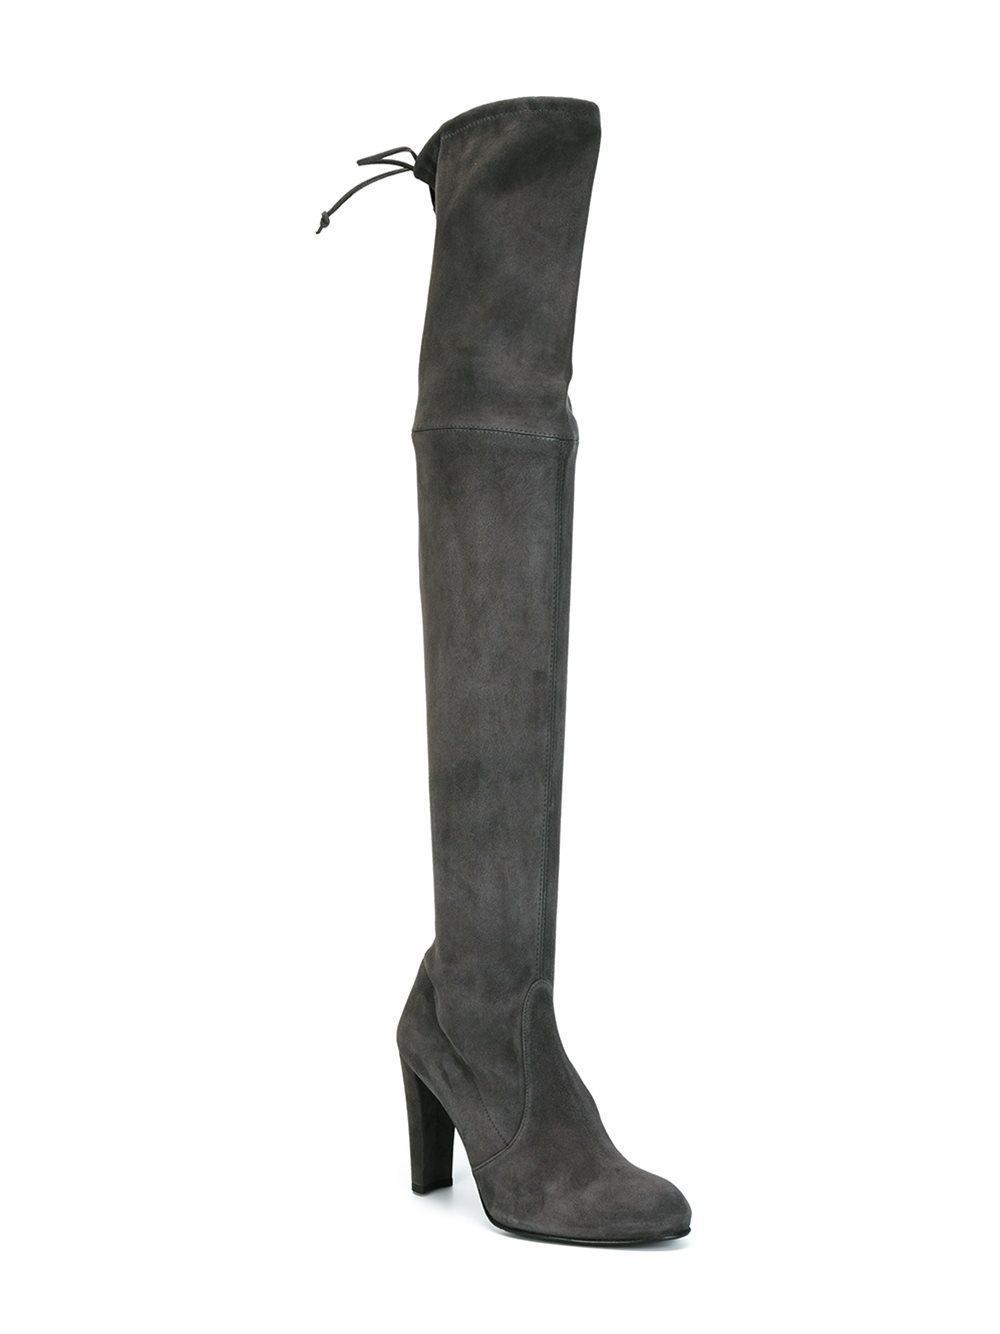 Stuart Weitzman Highland Suede Boot in Grey (Grey)